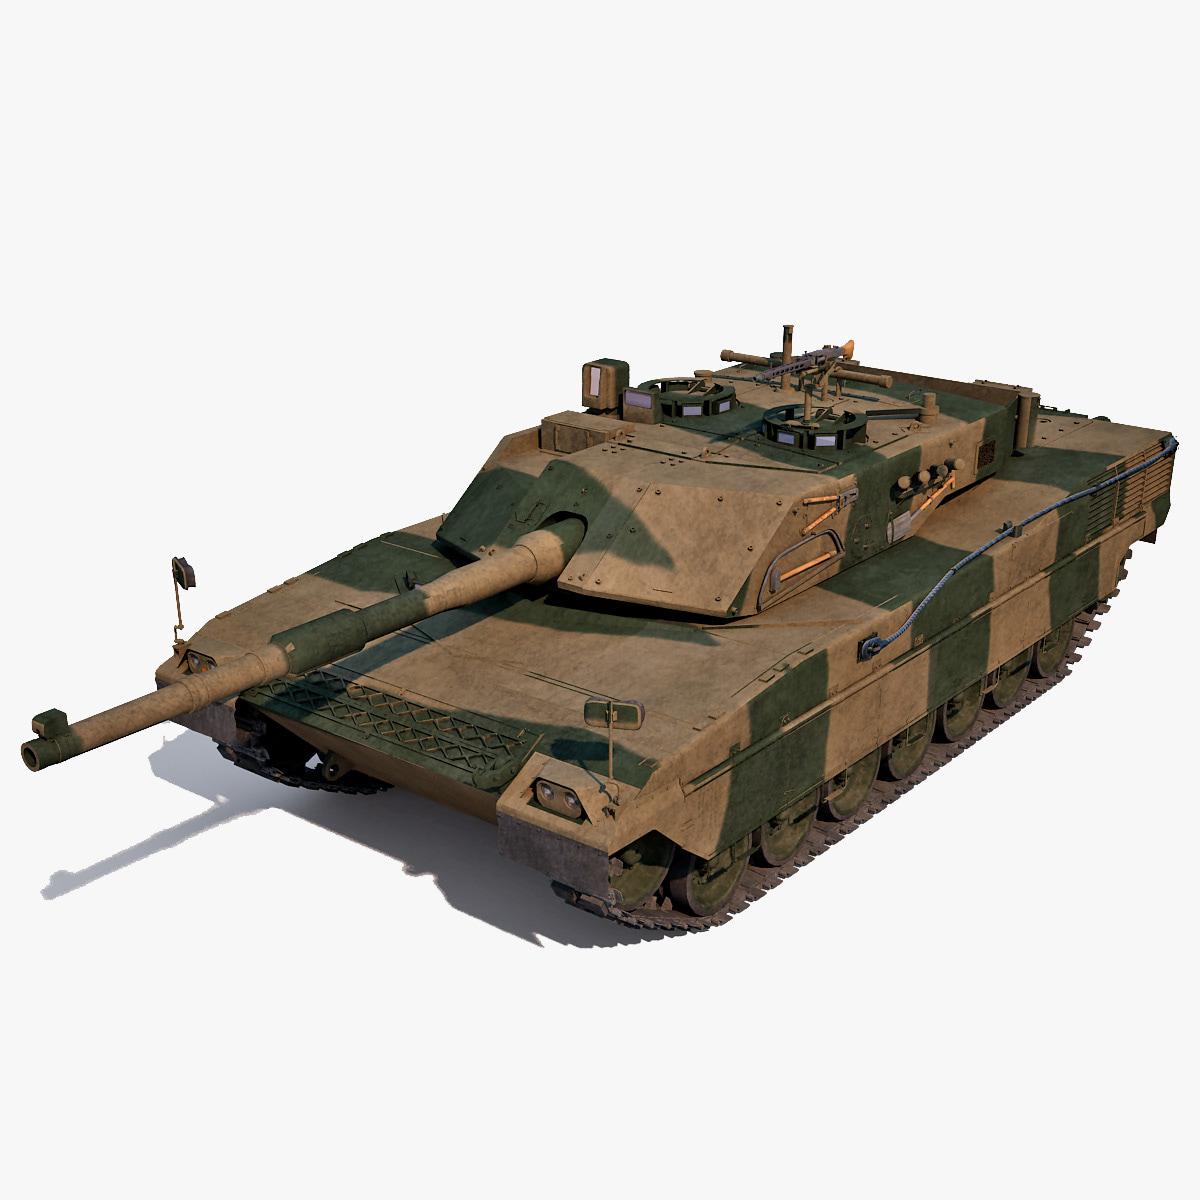 C1_Ariete_Italian_Battle_Tank_000.jpg